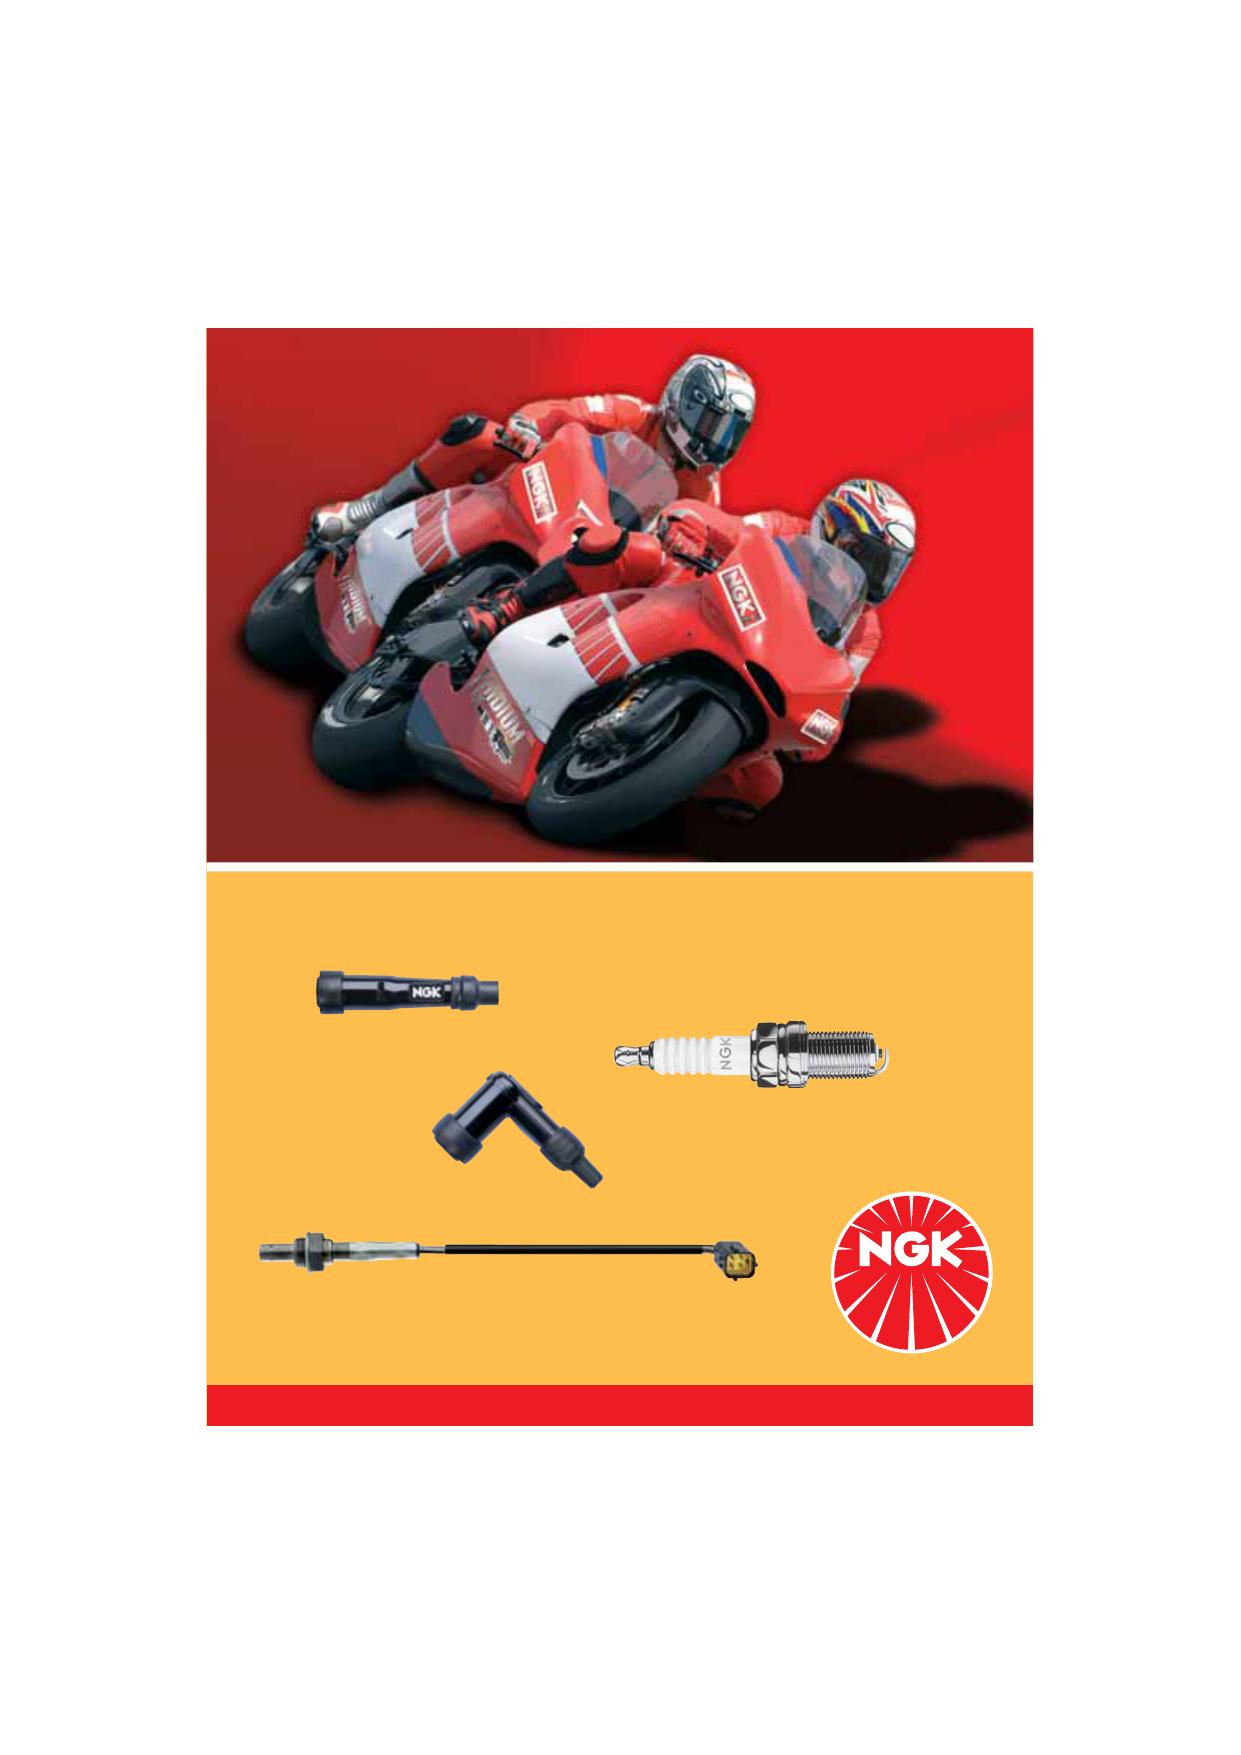 NGK Zündkerzenstecker 8160 LB05EMH-R RT rot KTM EXC 360 2T